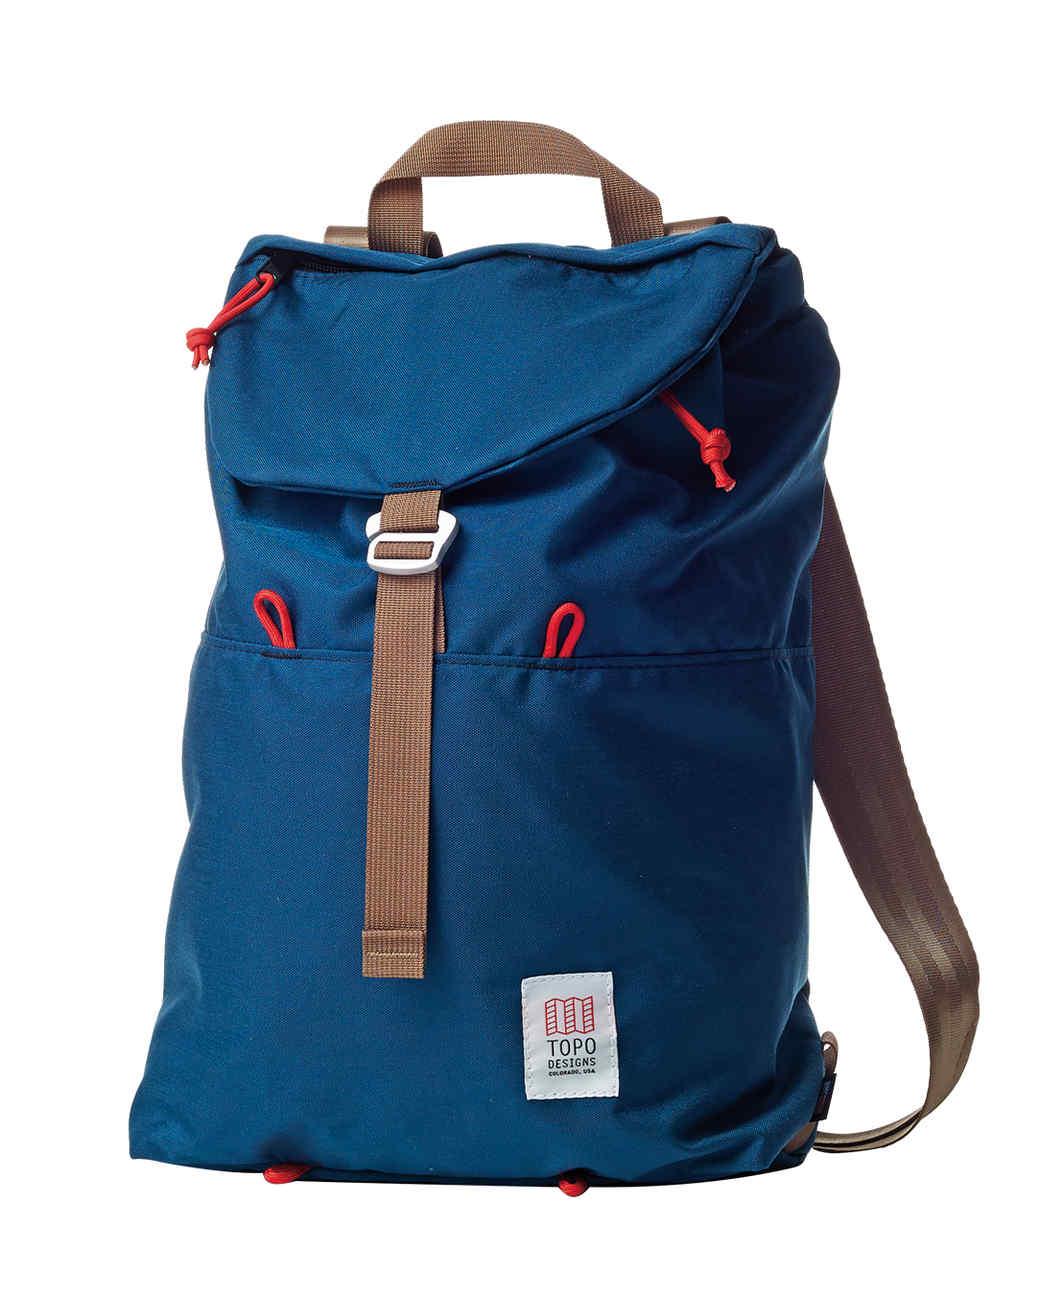 topo-designs-navy-backpack-115-d112186.jpg